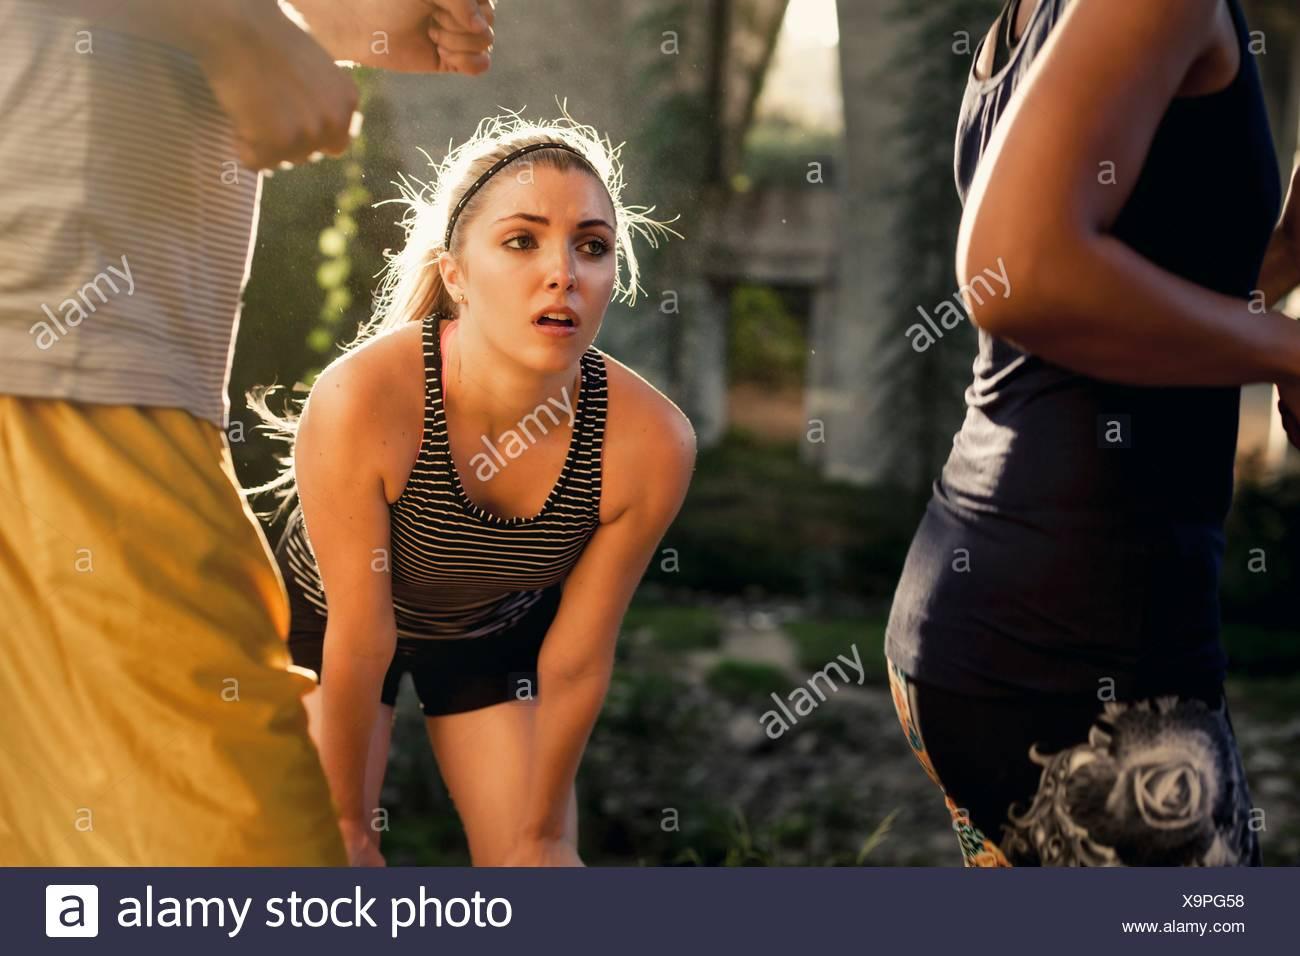 Jogger laufen vorbei an Jogger unter brechen, Arroyo Seco Park, Pasadena, Kalifornien, USA Stockbild